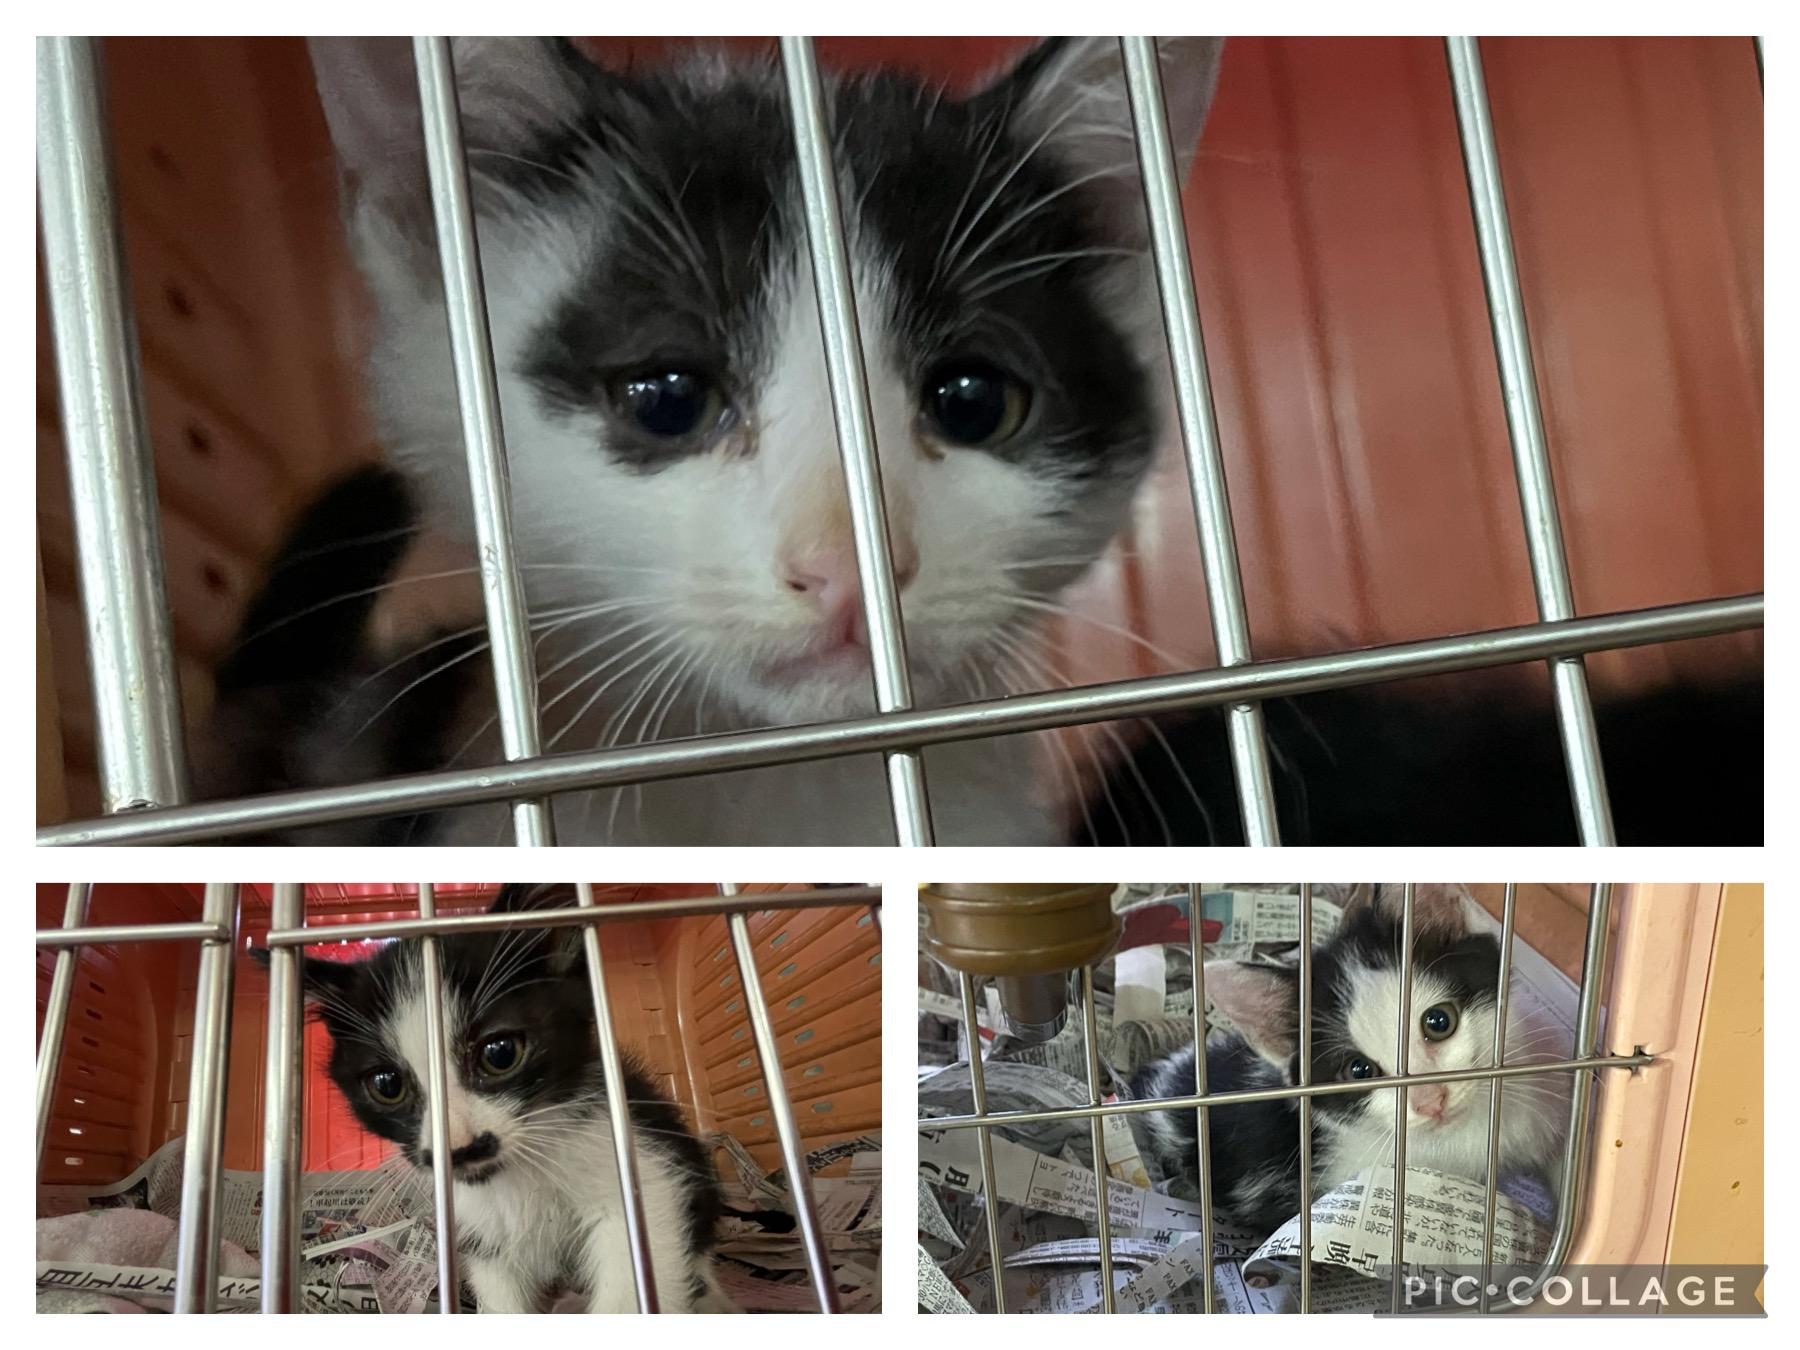 <p></p> <ul> <li>猫種:日本猫</li> <li>性別:男の子2匹 女の子1匹</li> <li>年齢:2021年4月初旬頃生まれ</li> <li>保護経緯:譲渡センターで里親を探して欲しいとの事で保護しました。</li> </ul>